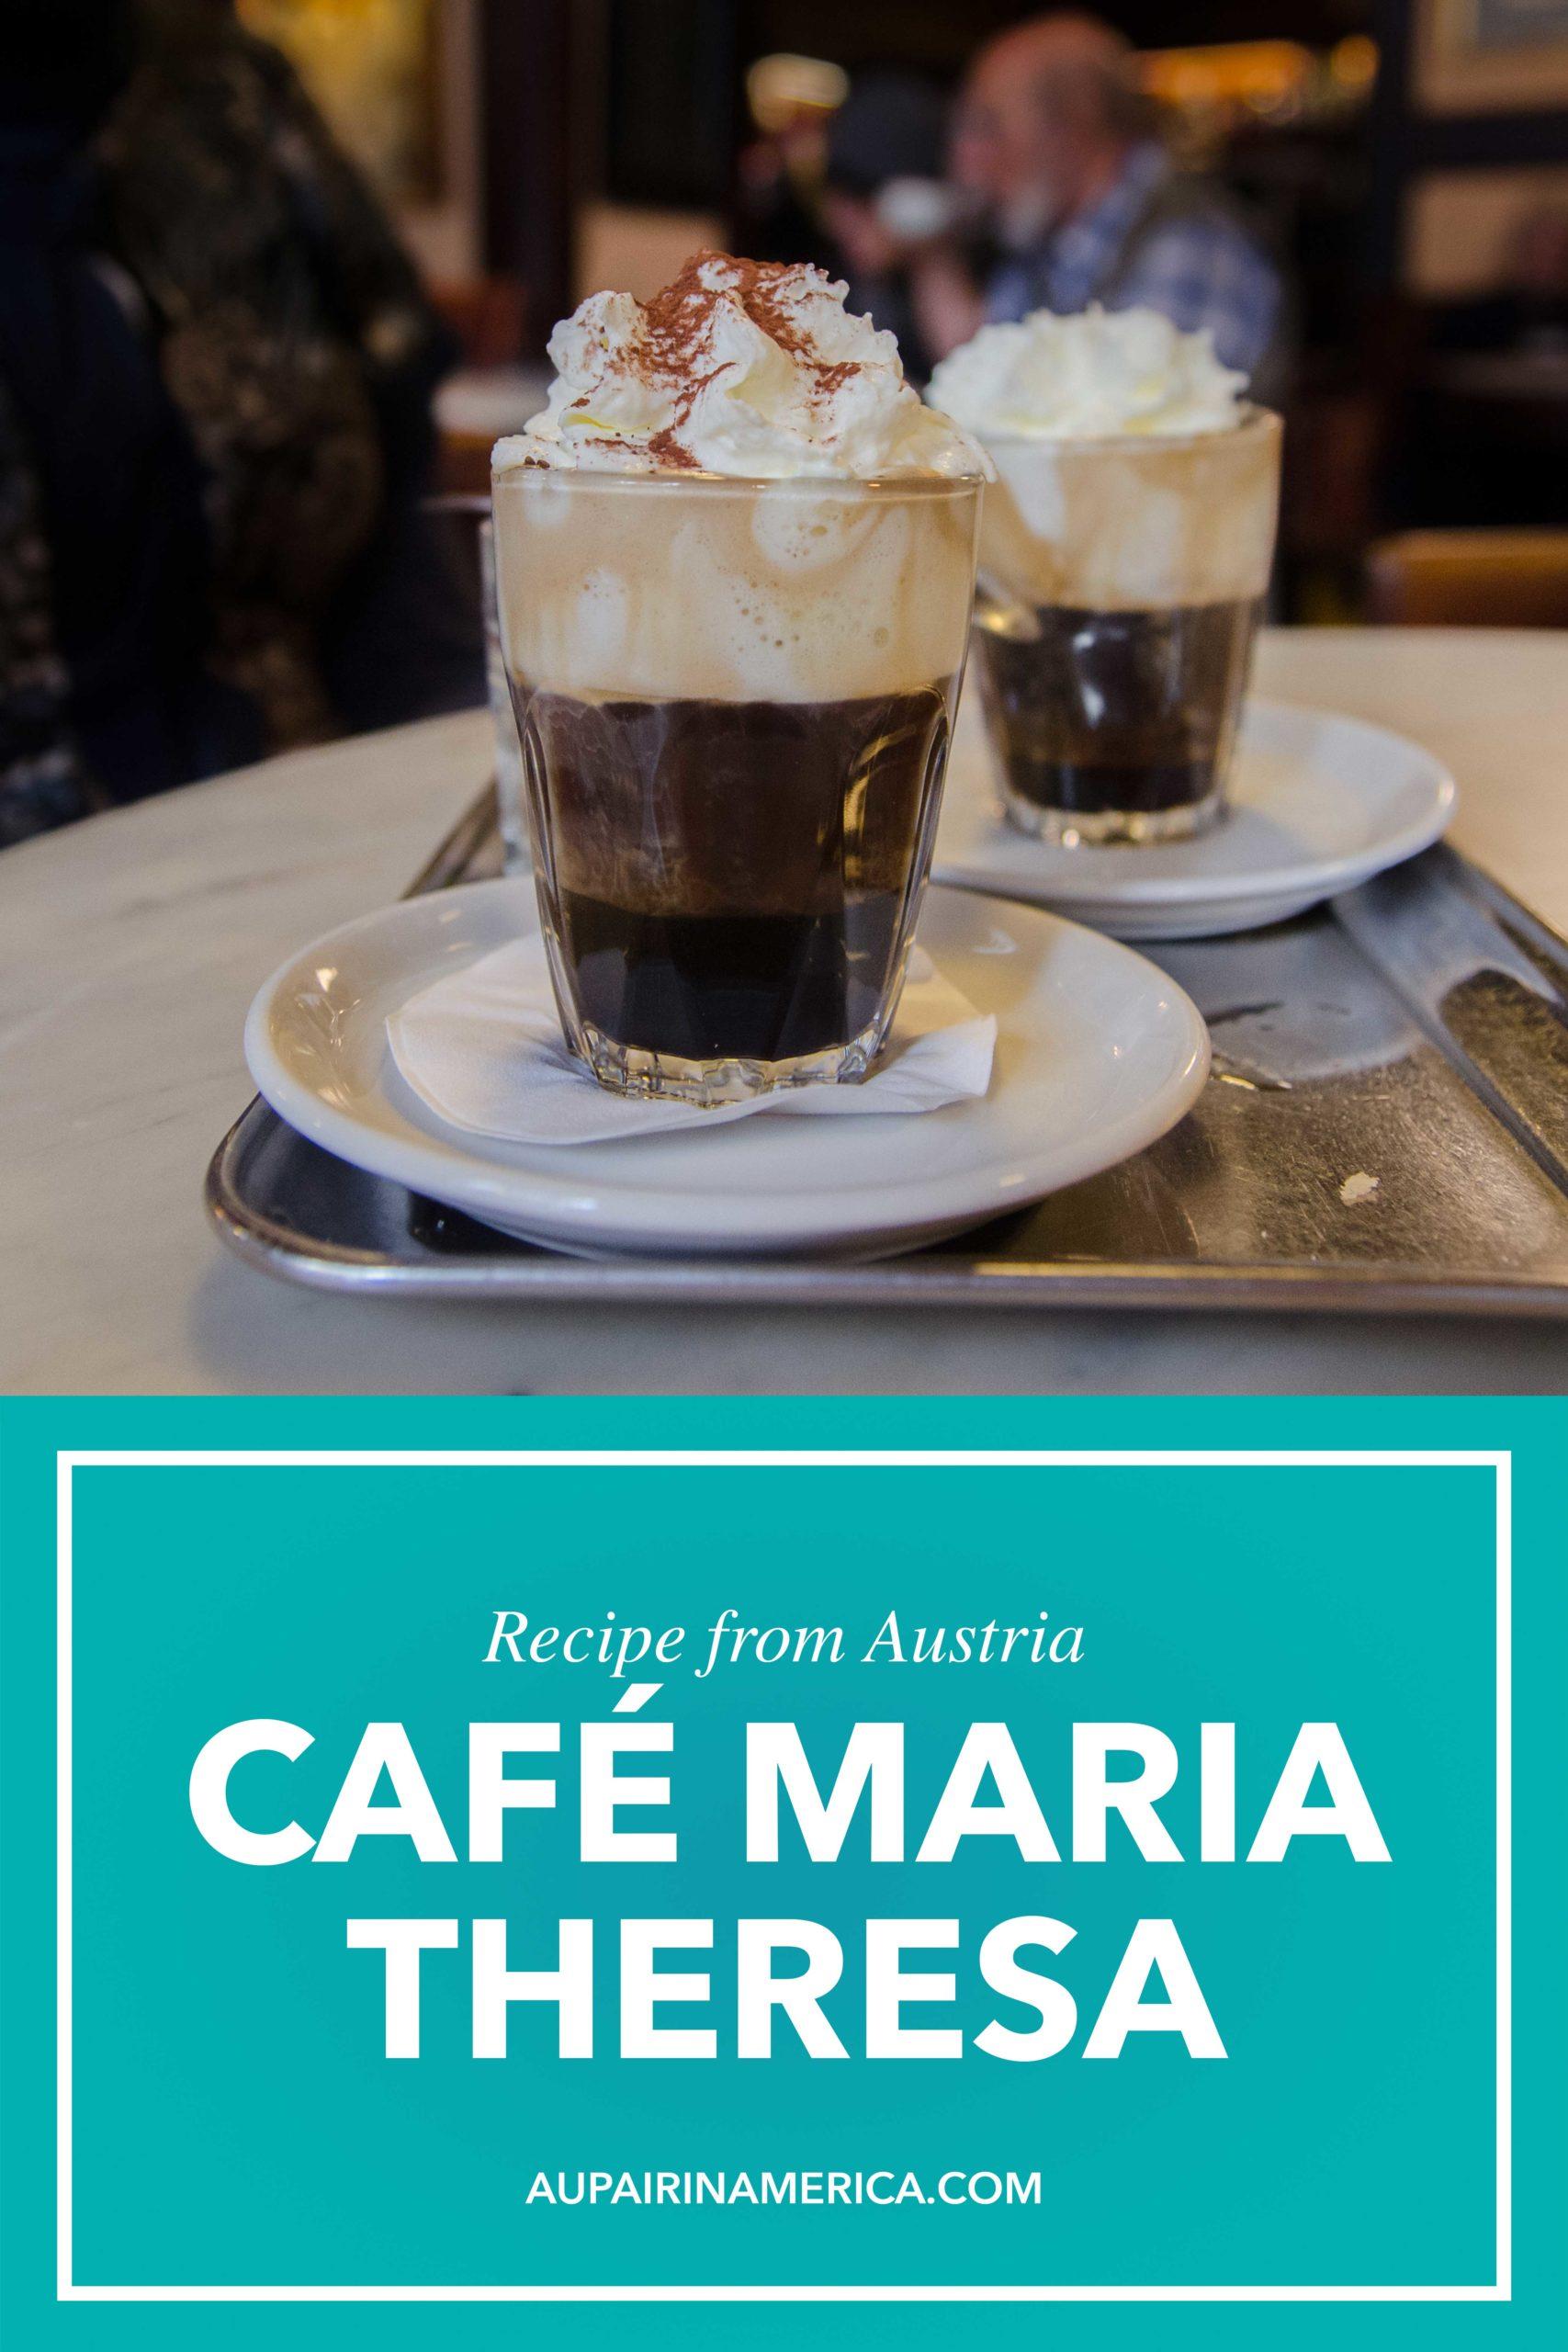 Recipe from Austria: Café Maria Theresa